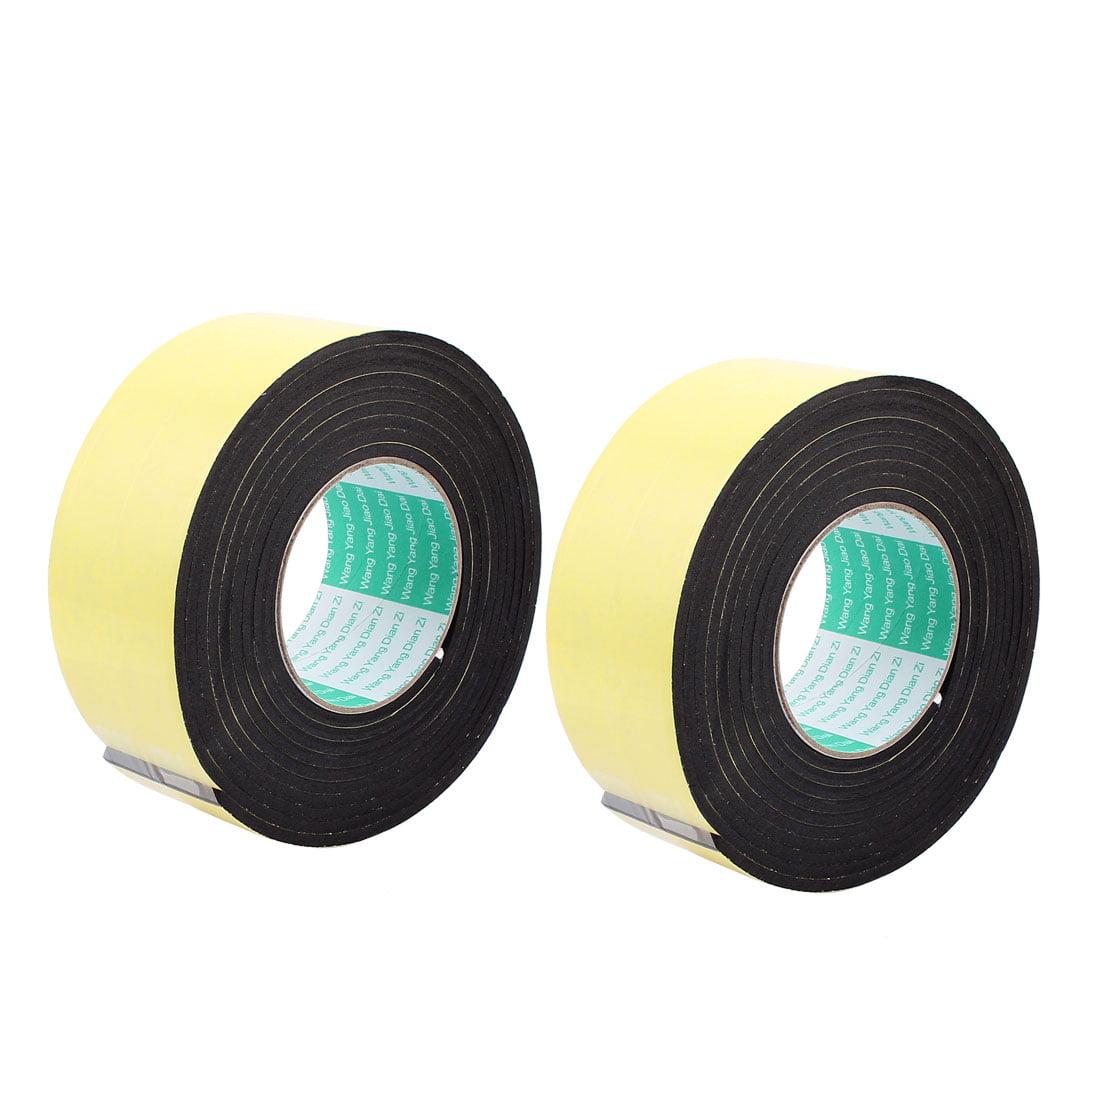 2 Pcs 6CM Width 3 Meters Long 4MM Thick Single Sided Seal Shockproof Sponge Tape